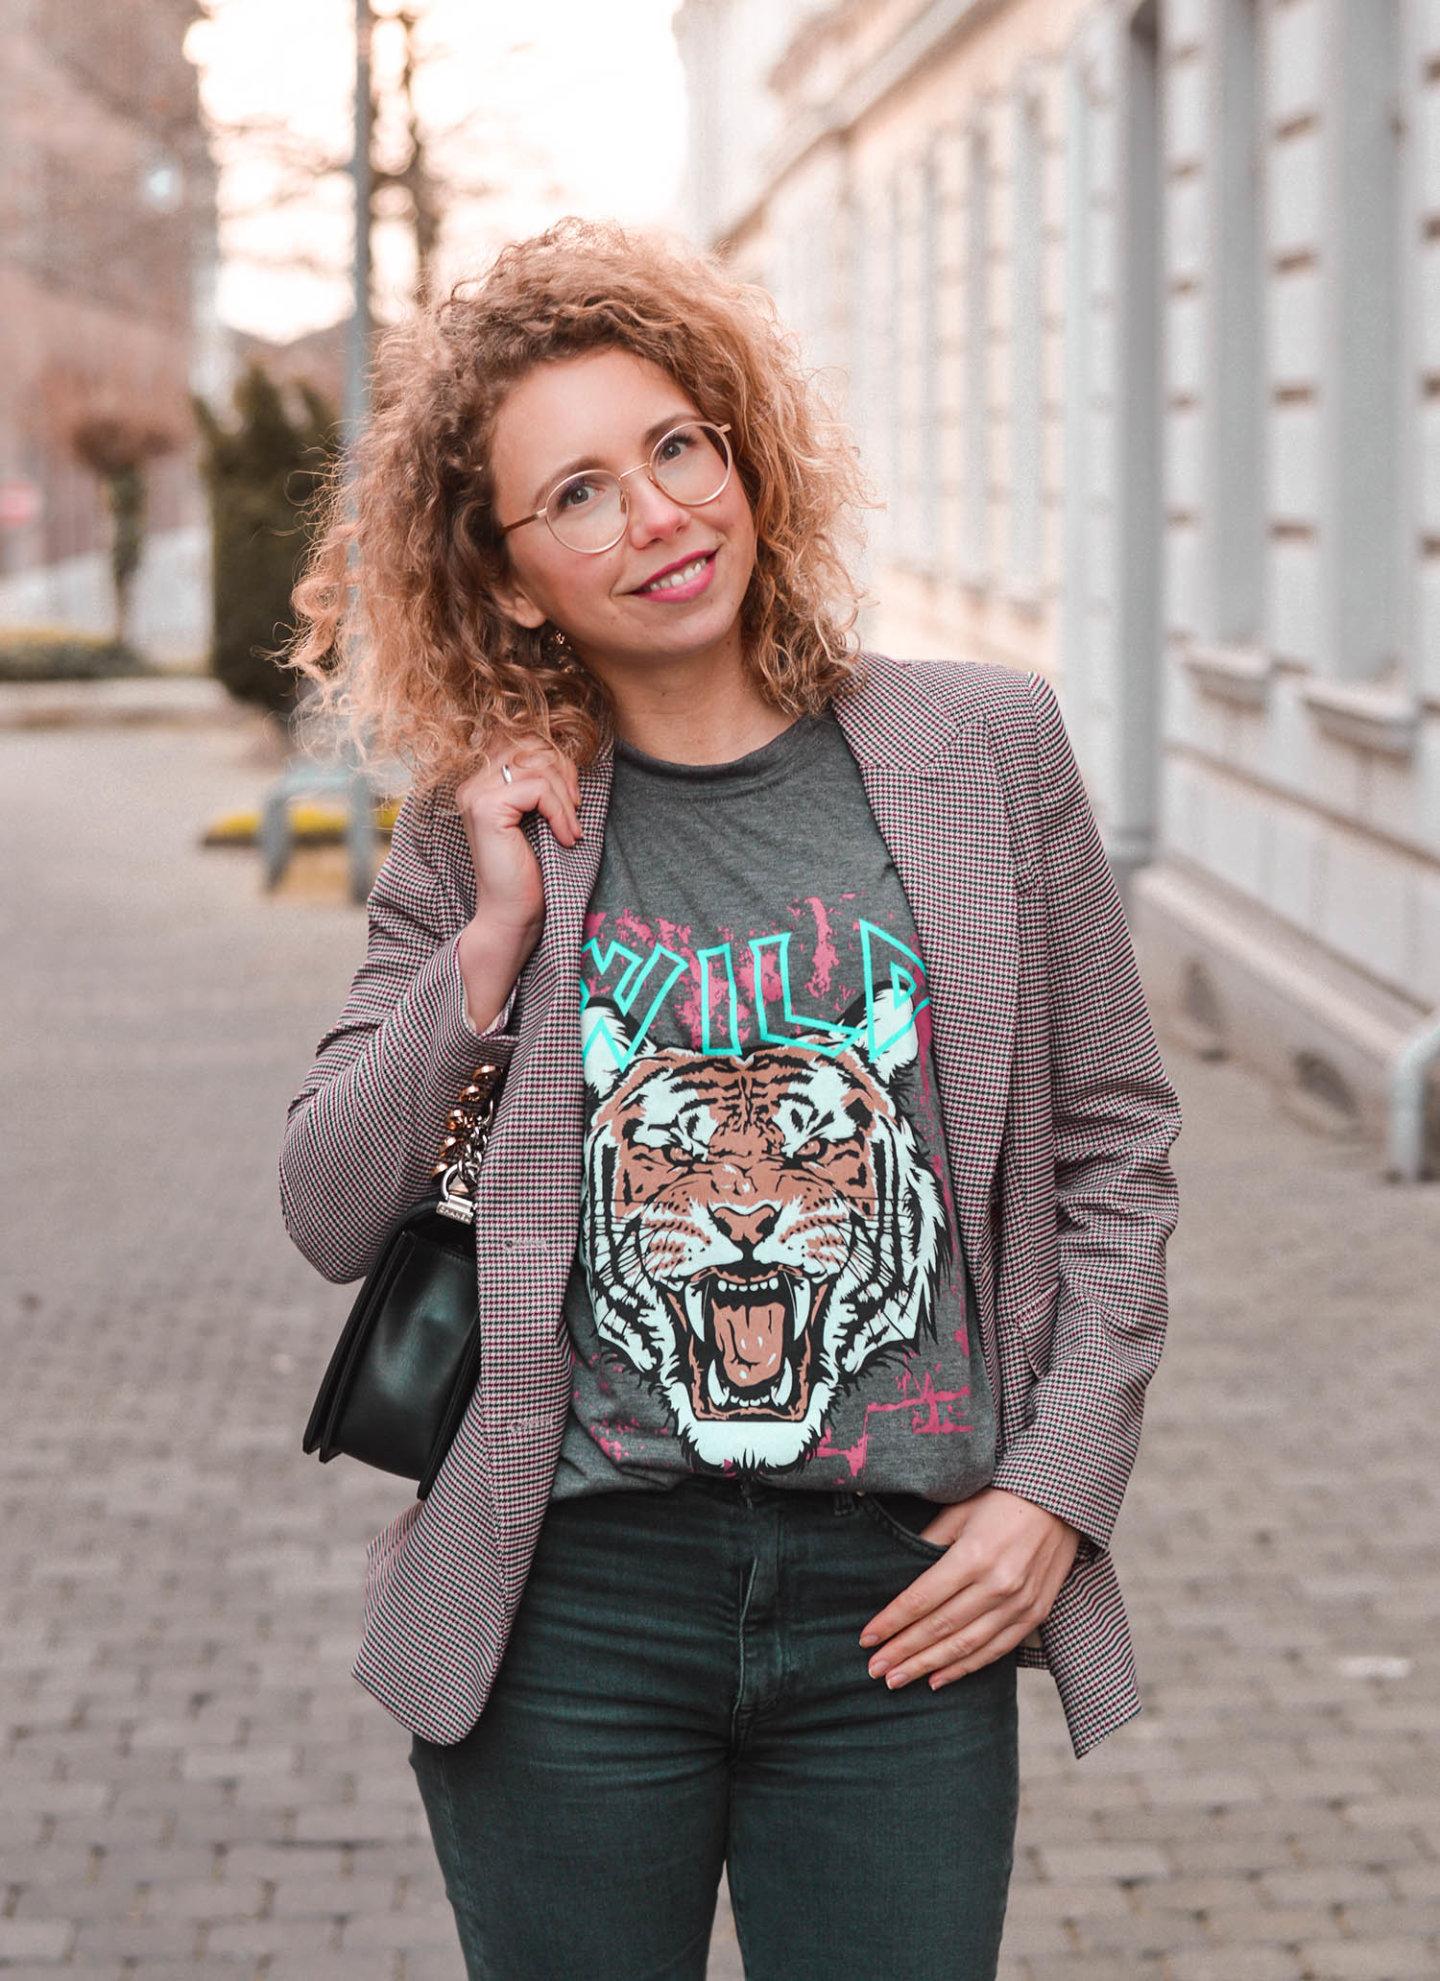 Anine Bing Lookalike Shirt - Fashiontrend 2020